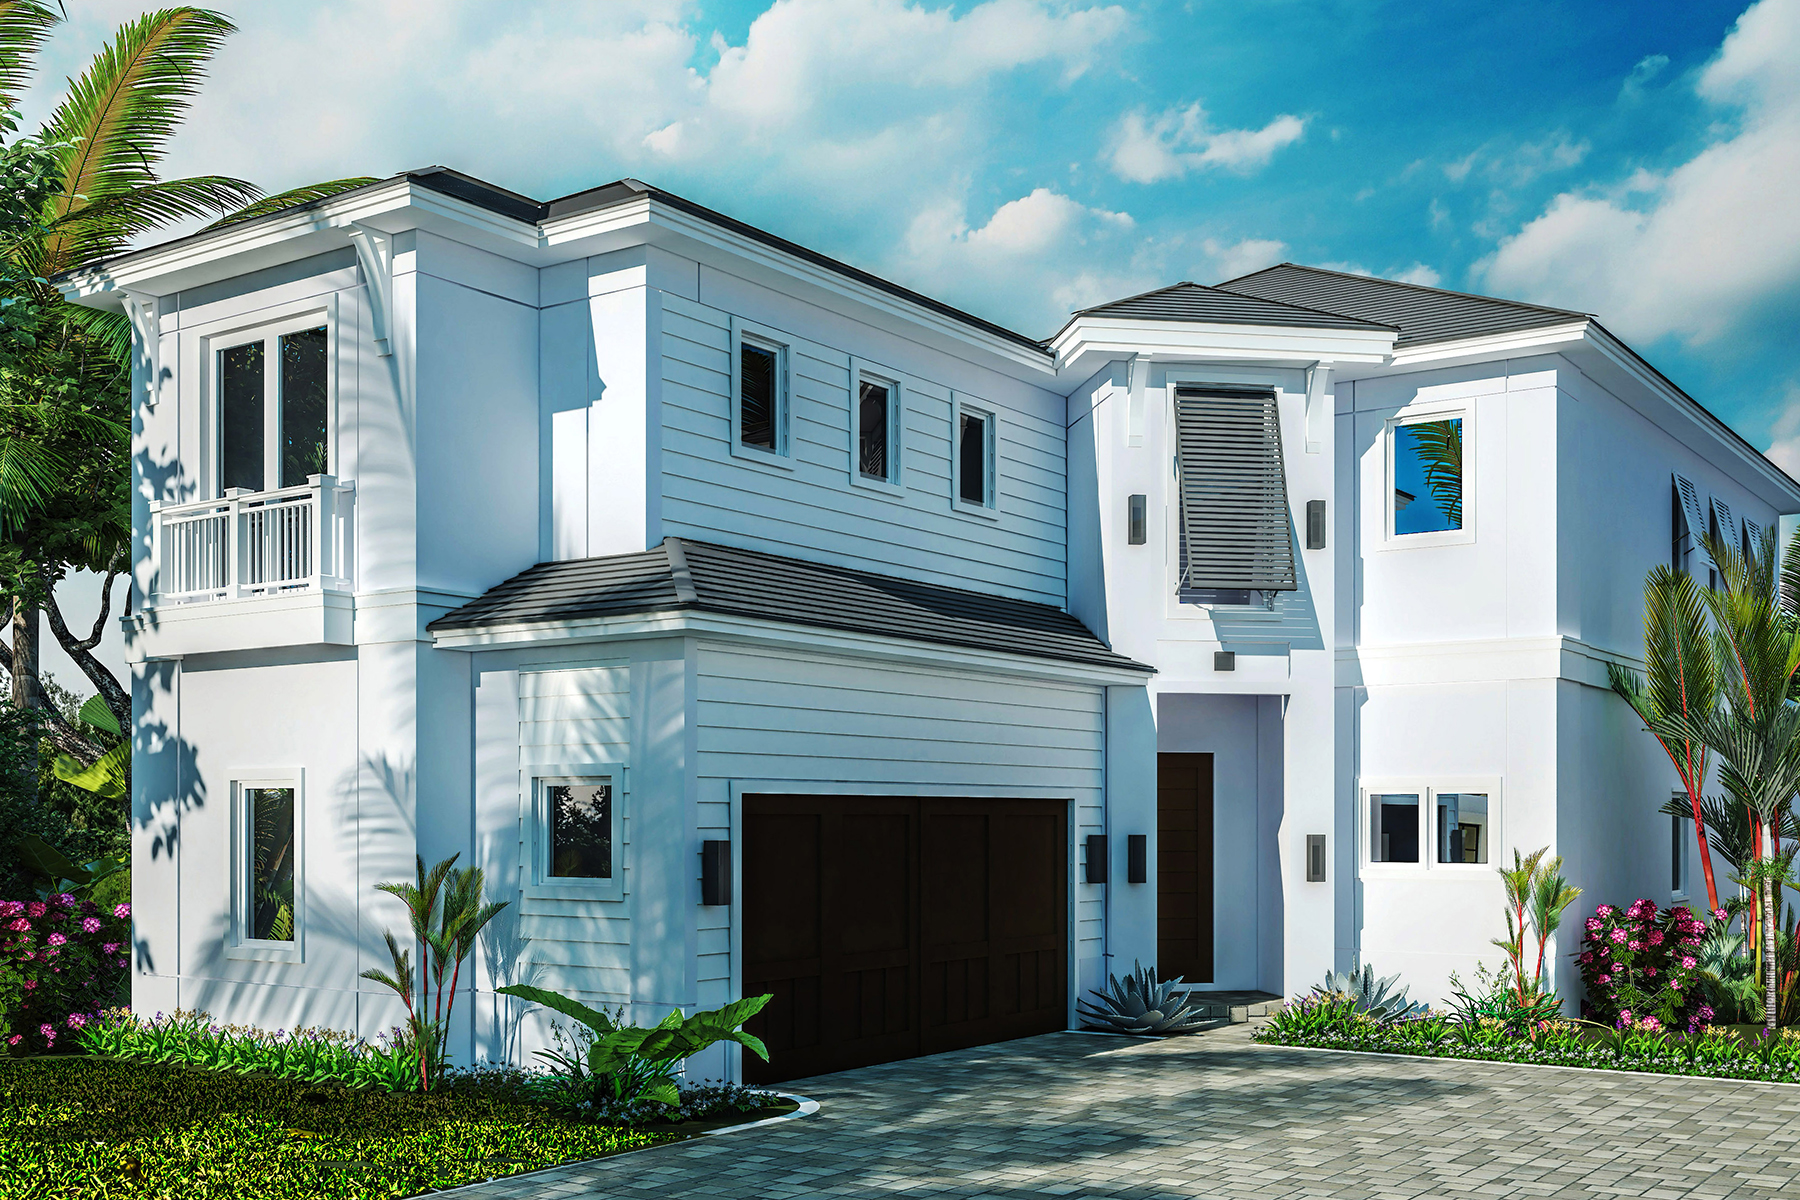 Single Family Home for Sale at Mercato 9197 Mercato Way, Naples, Florida 34108 United States